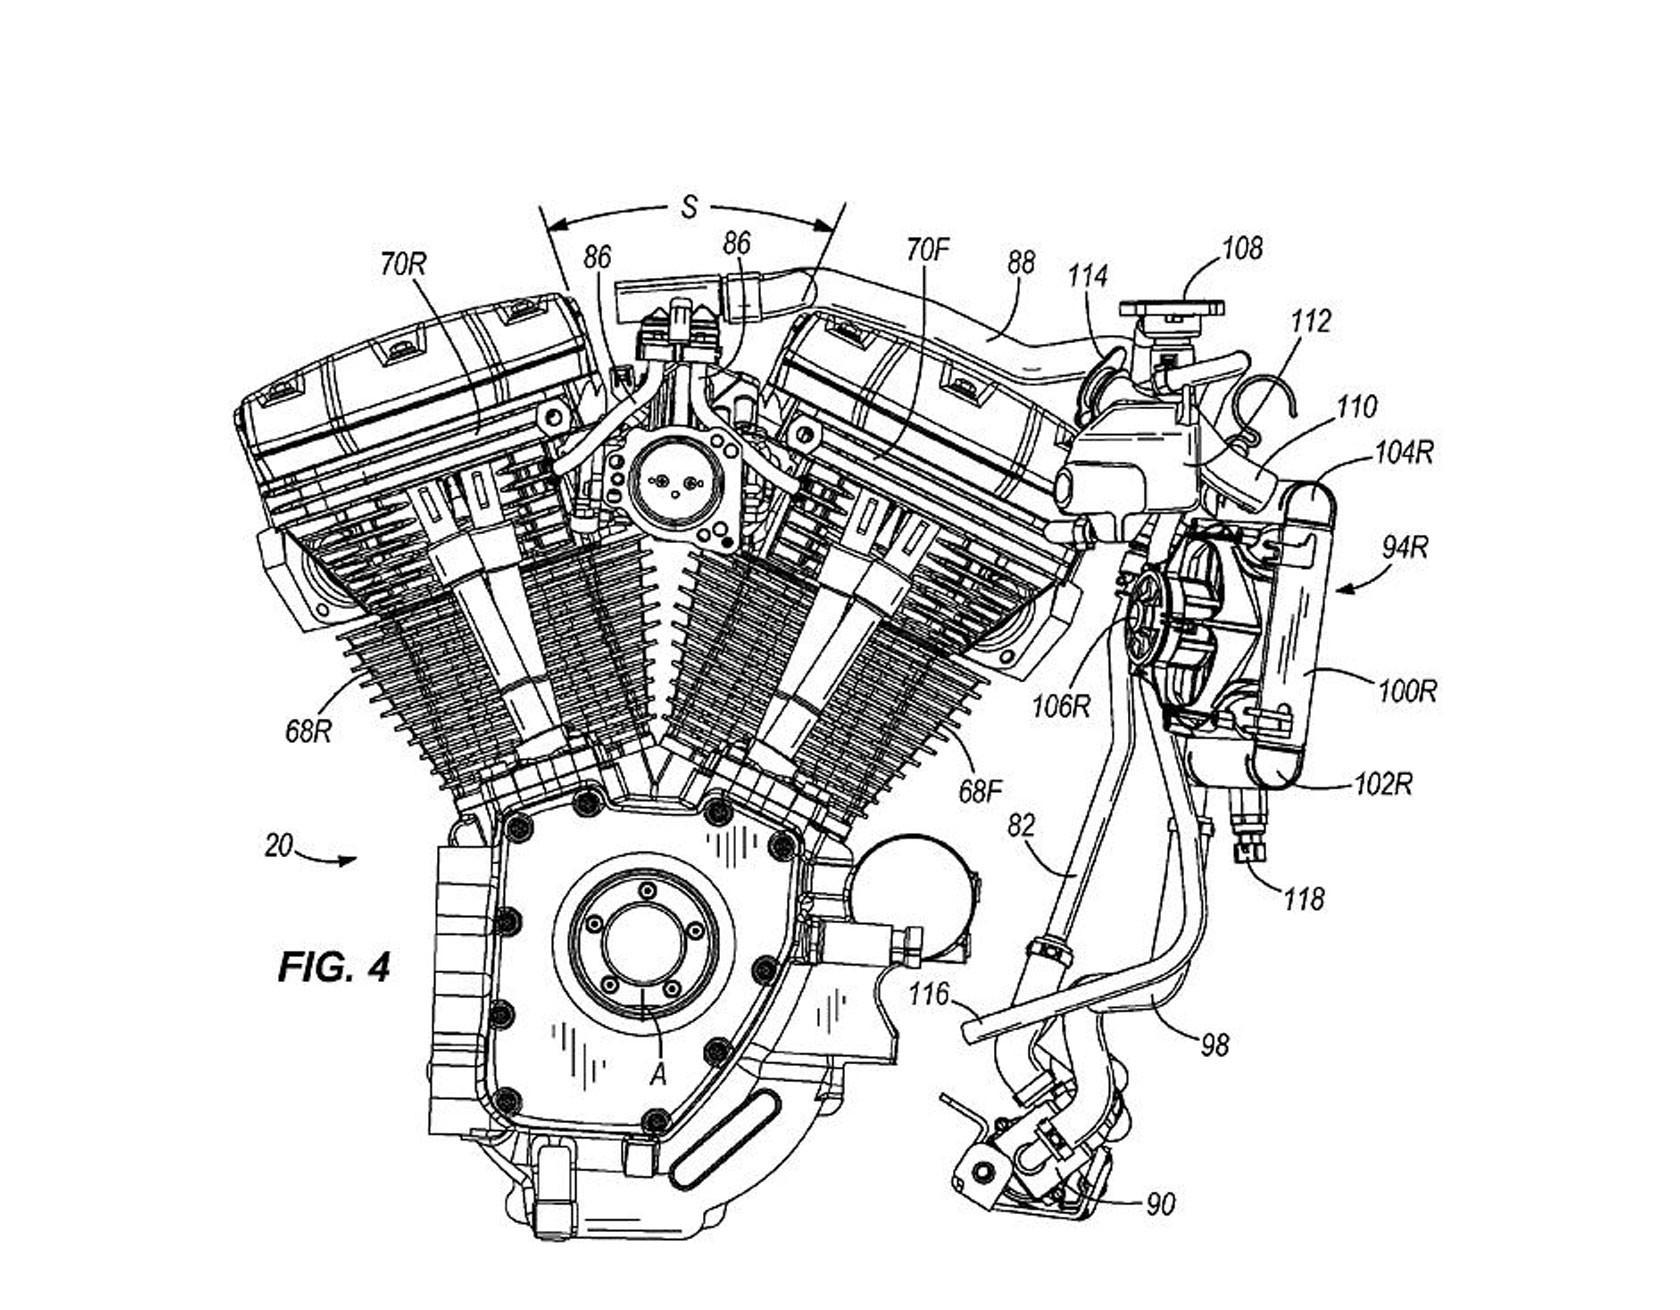 Harley Davidson Twin Cam Engine Diagram Harley Davidson Motor Diagram Wiring Diagram Go Of Harley Davidson Twin Cam Engine Diagram